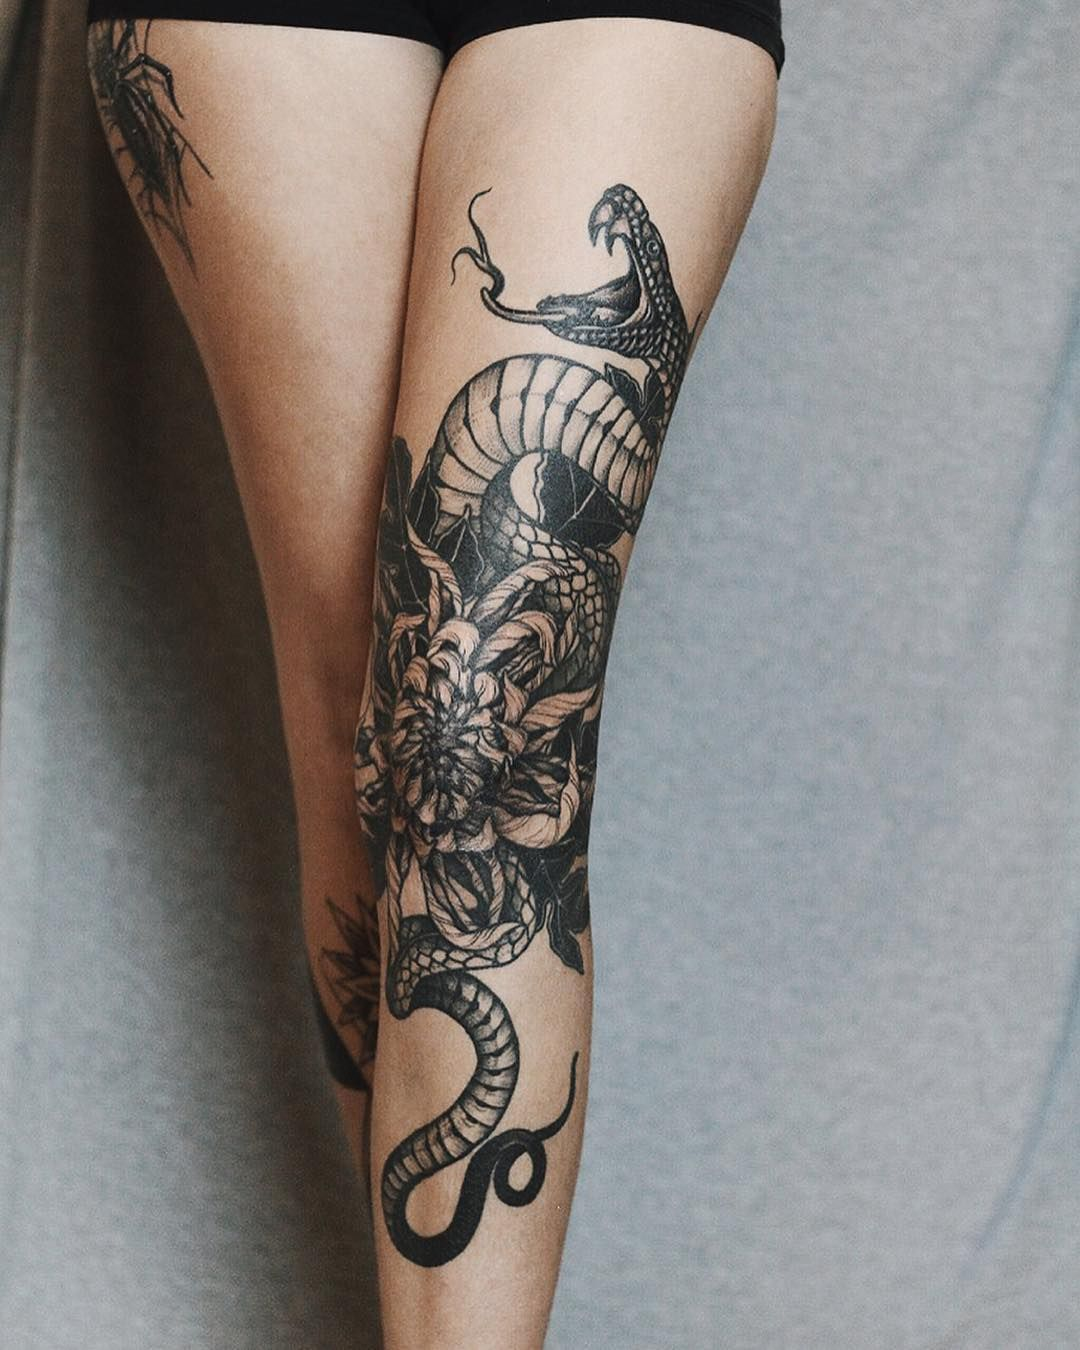 35 Amazing Rattlesnake Tattoo Designs Ideas // March, 2020